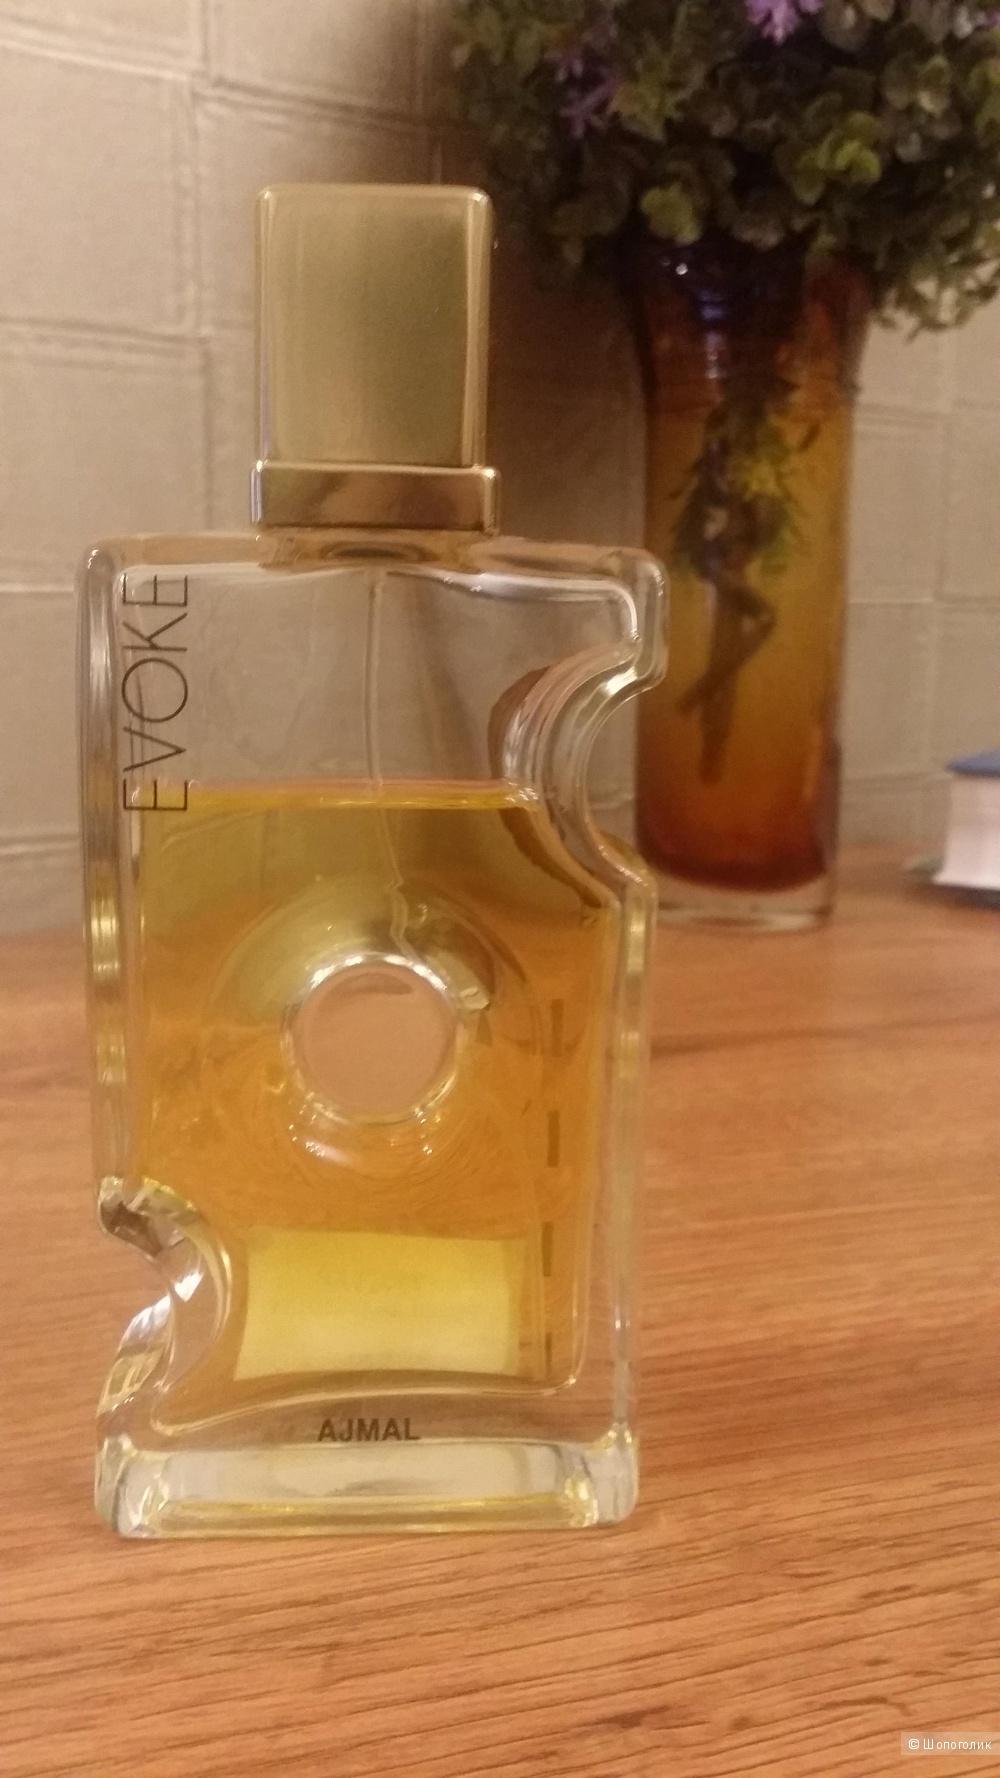 Ajmal Evoke Her EDP Парфюмерная вода (Eau de Parfum), остаток от 75 мл